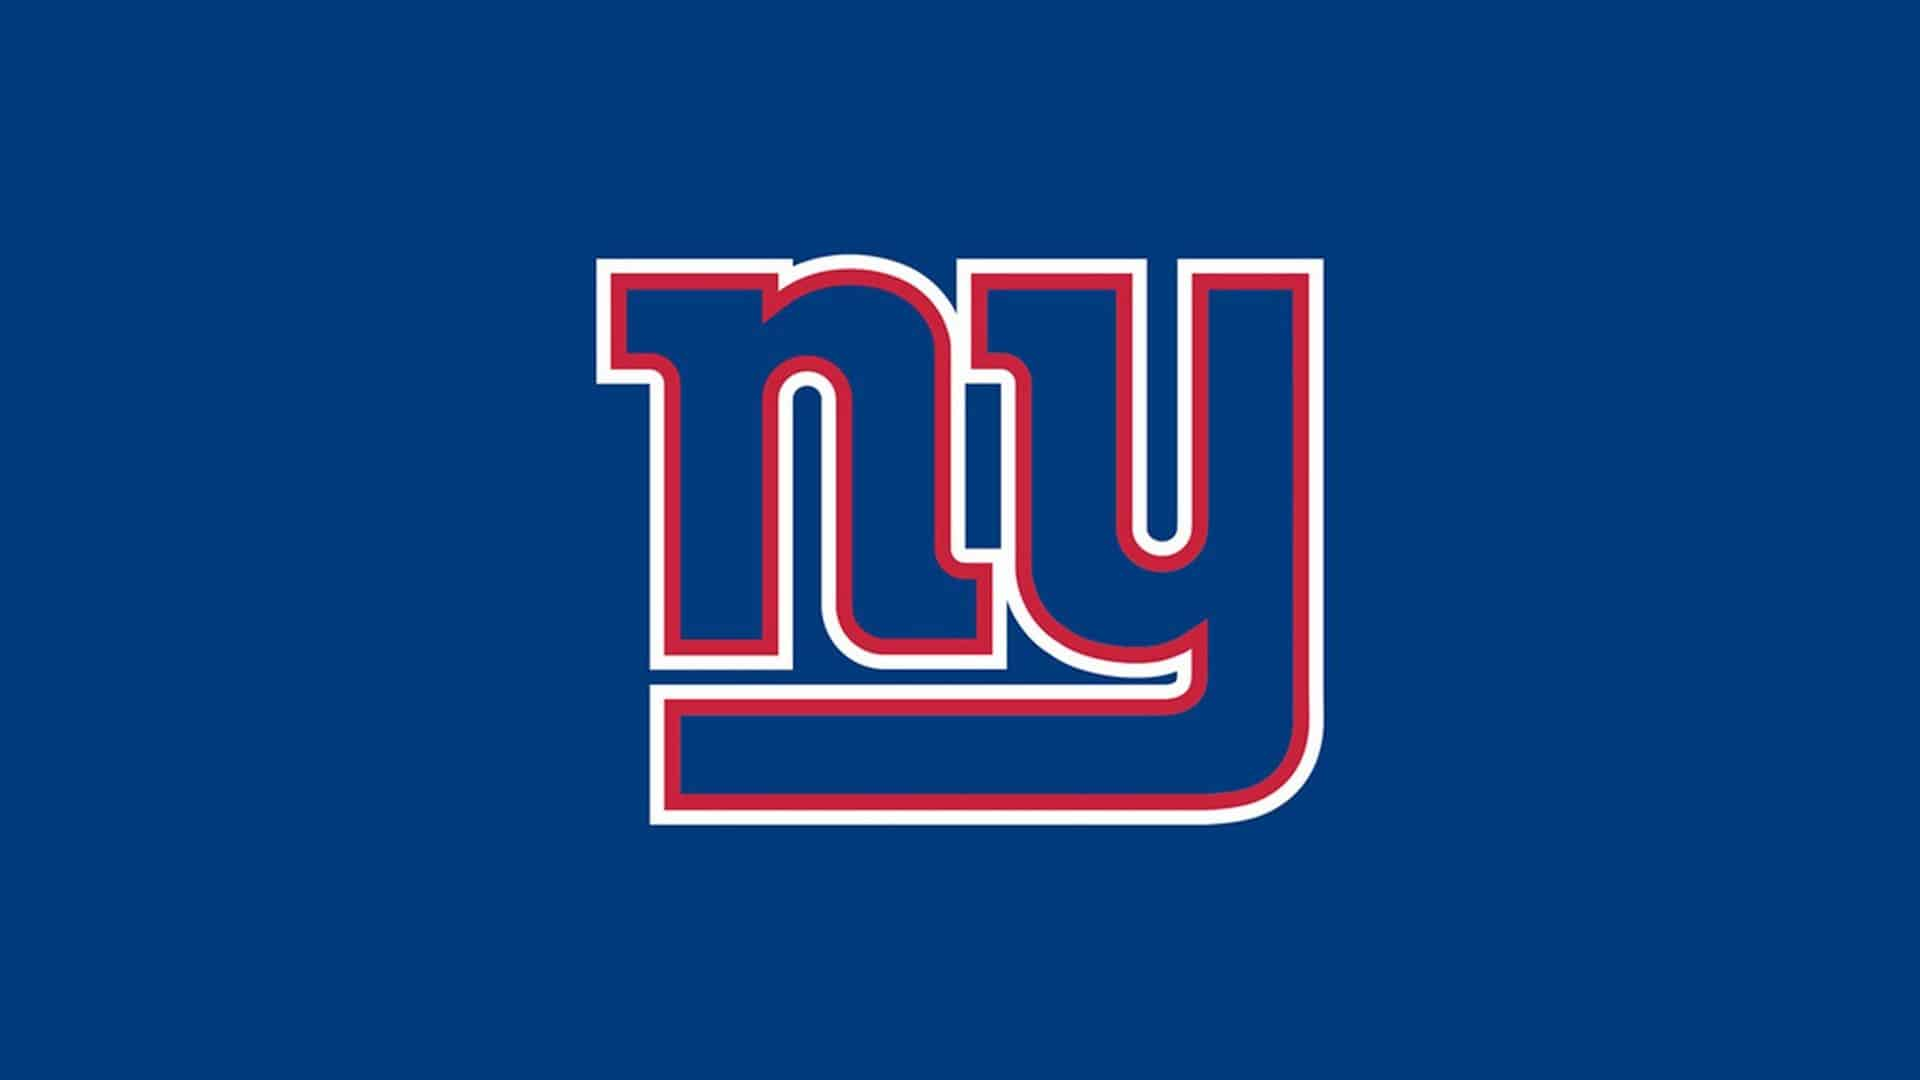 Richest NFL Teams - New York Giants